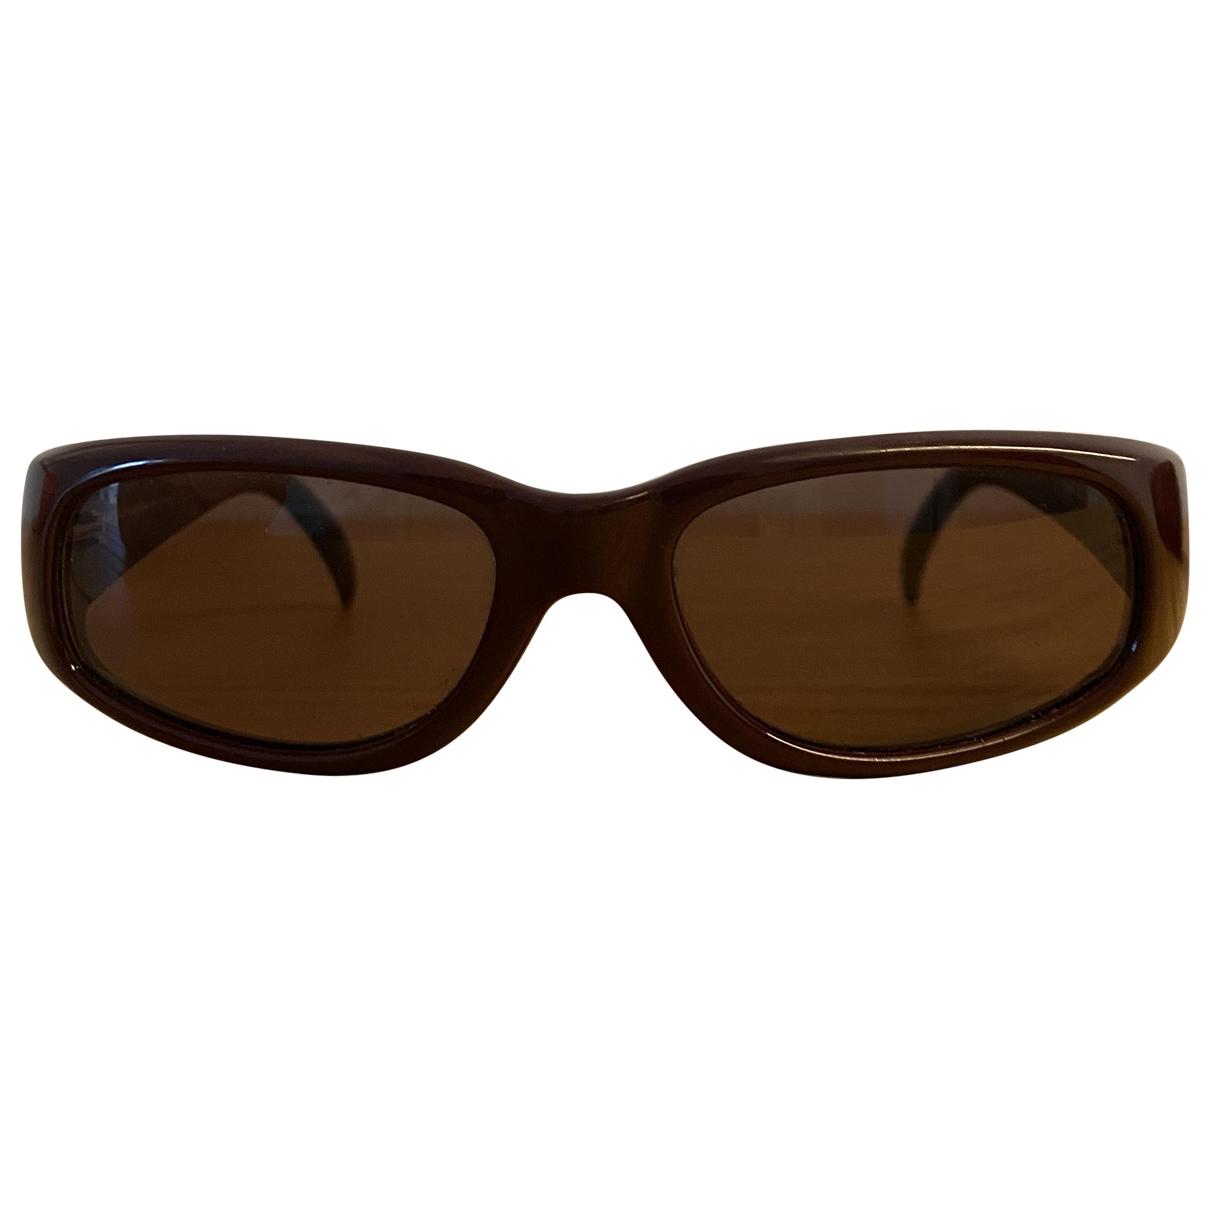 D&g \N Purple Sunglasses for Women \N